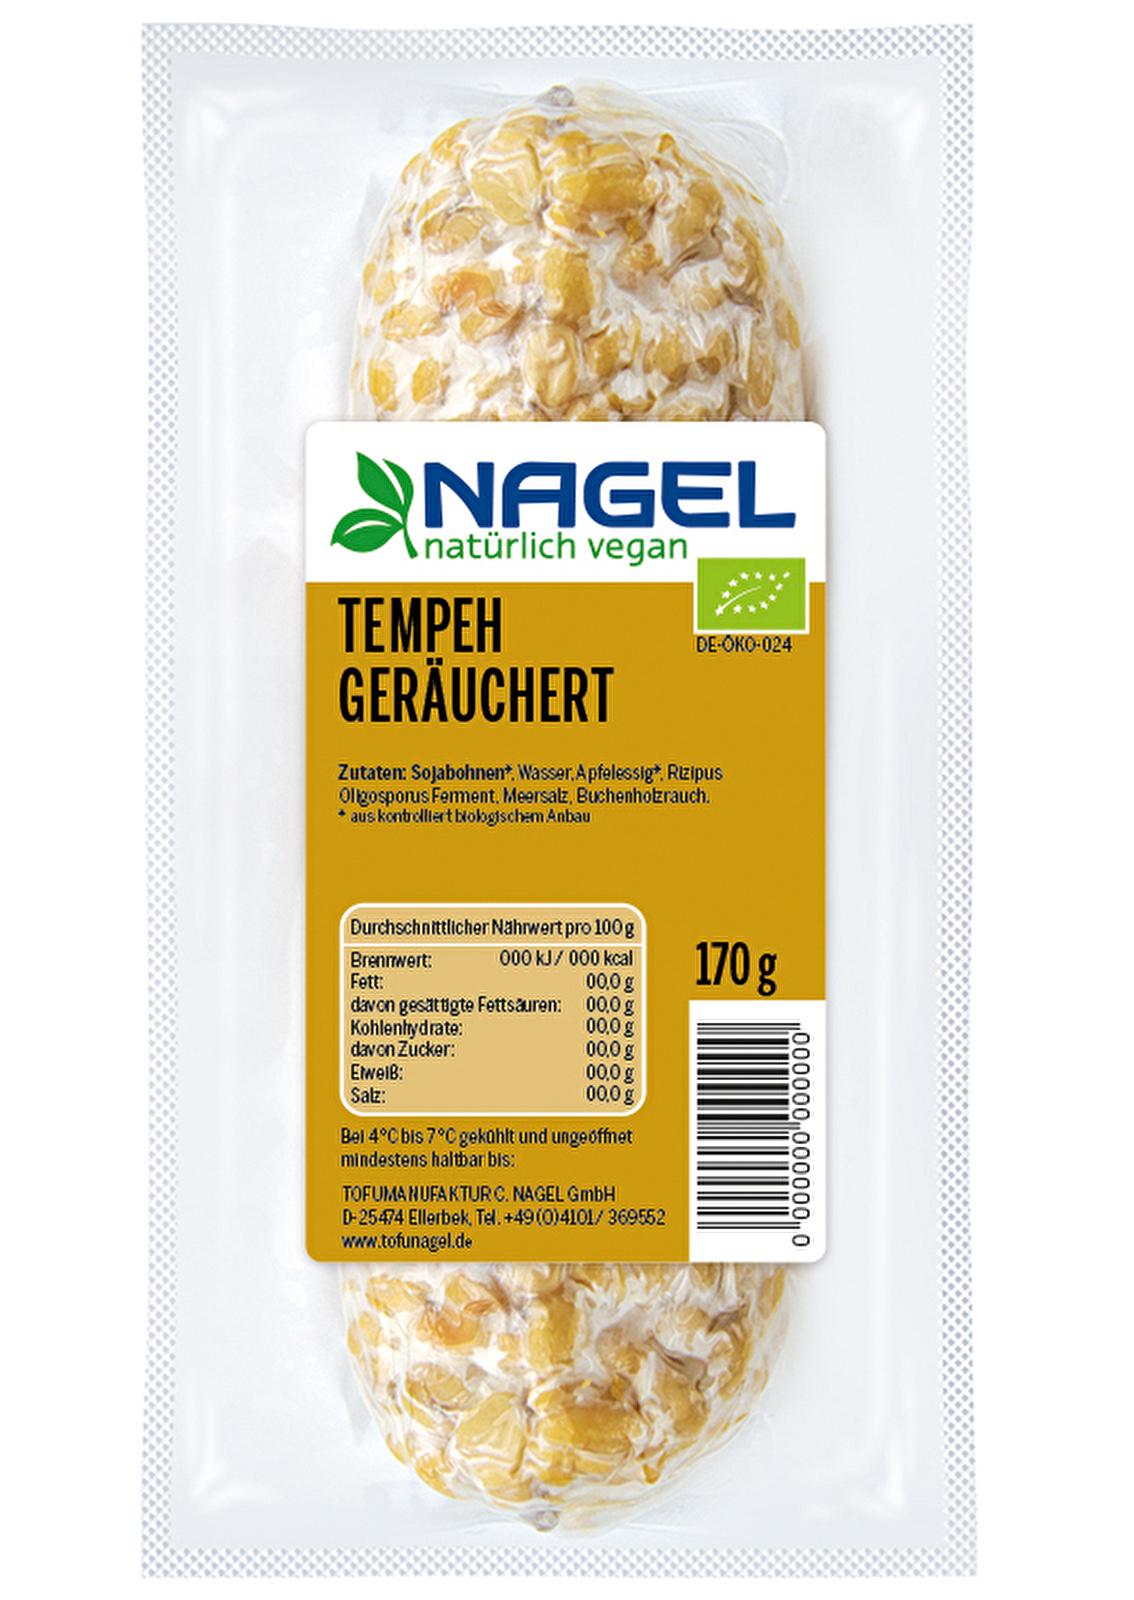 Nagel Tofumanufaktur - Tempeh Geru00e4uchert Kaufen | Kokku - Dein Veganer Onlineshop